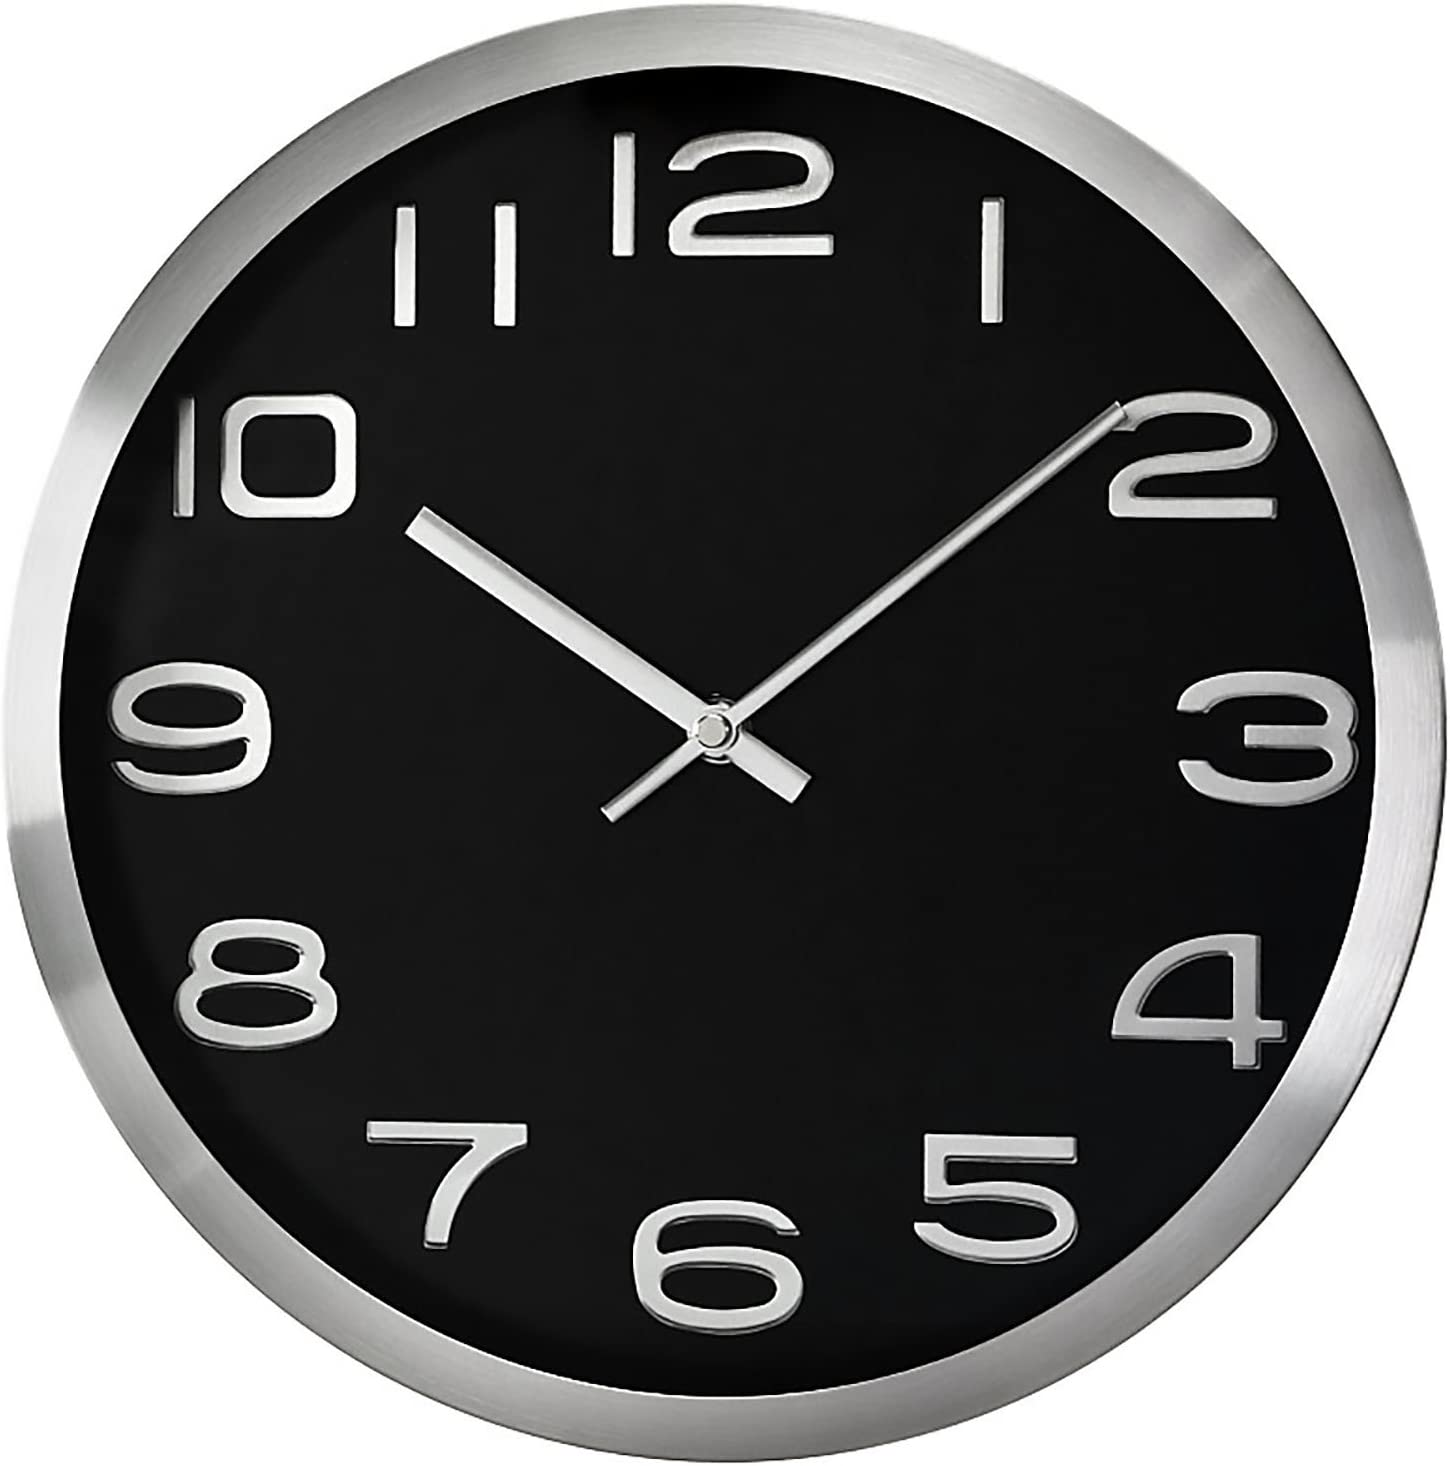 Chermond Wall Clock Metal Case No Second Hand Hq Amazon Co Uk Kitchen Home